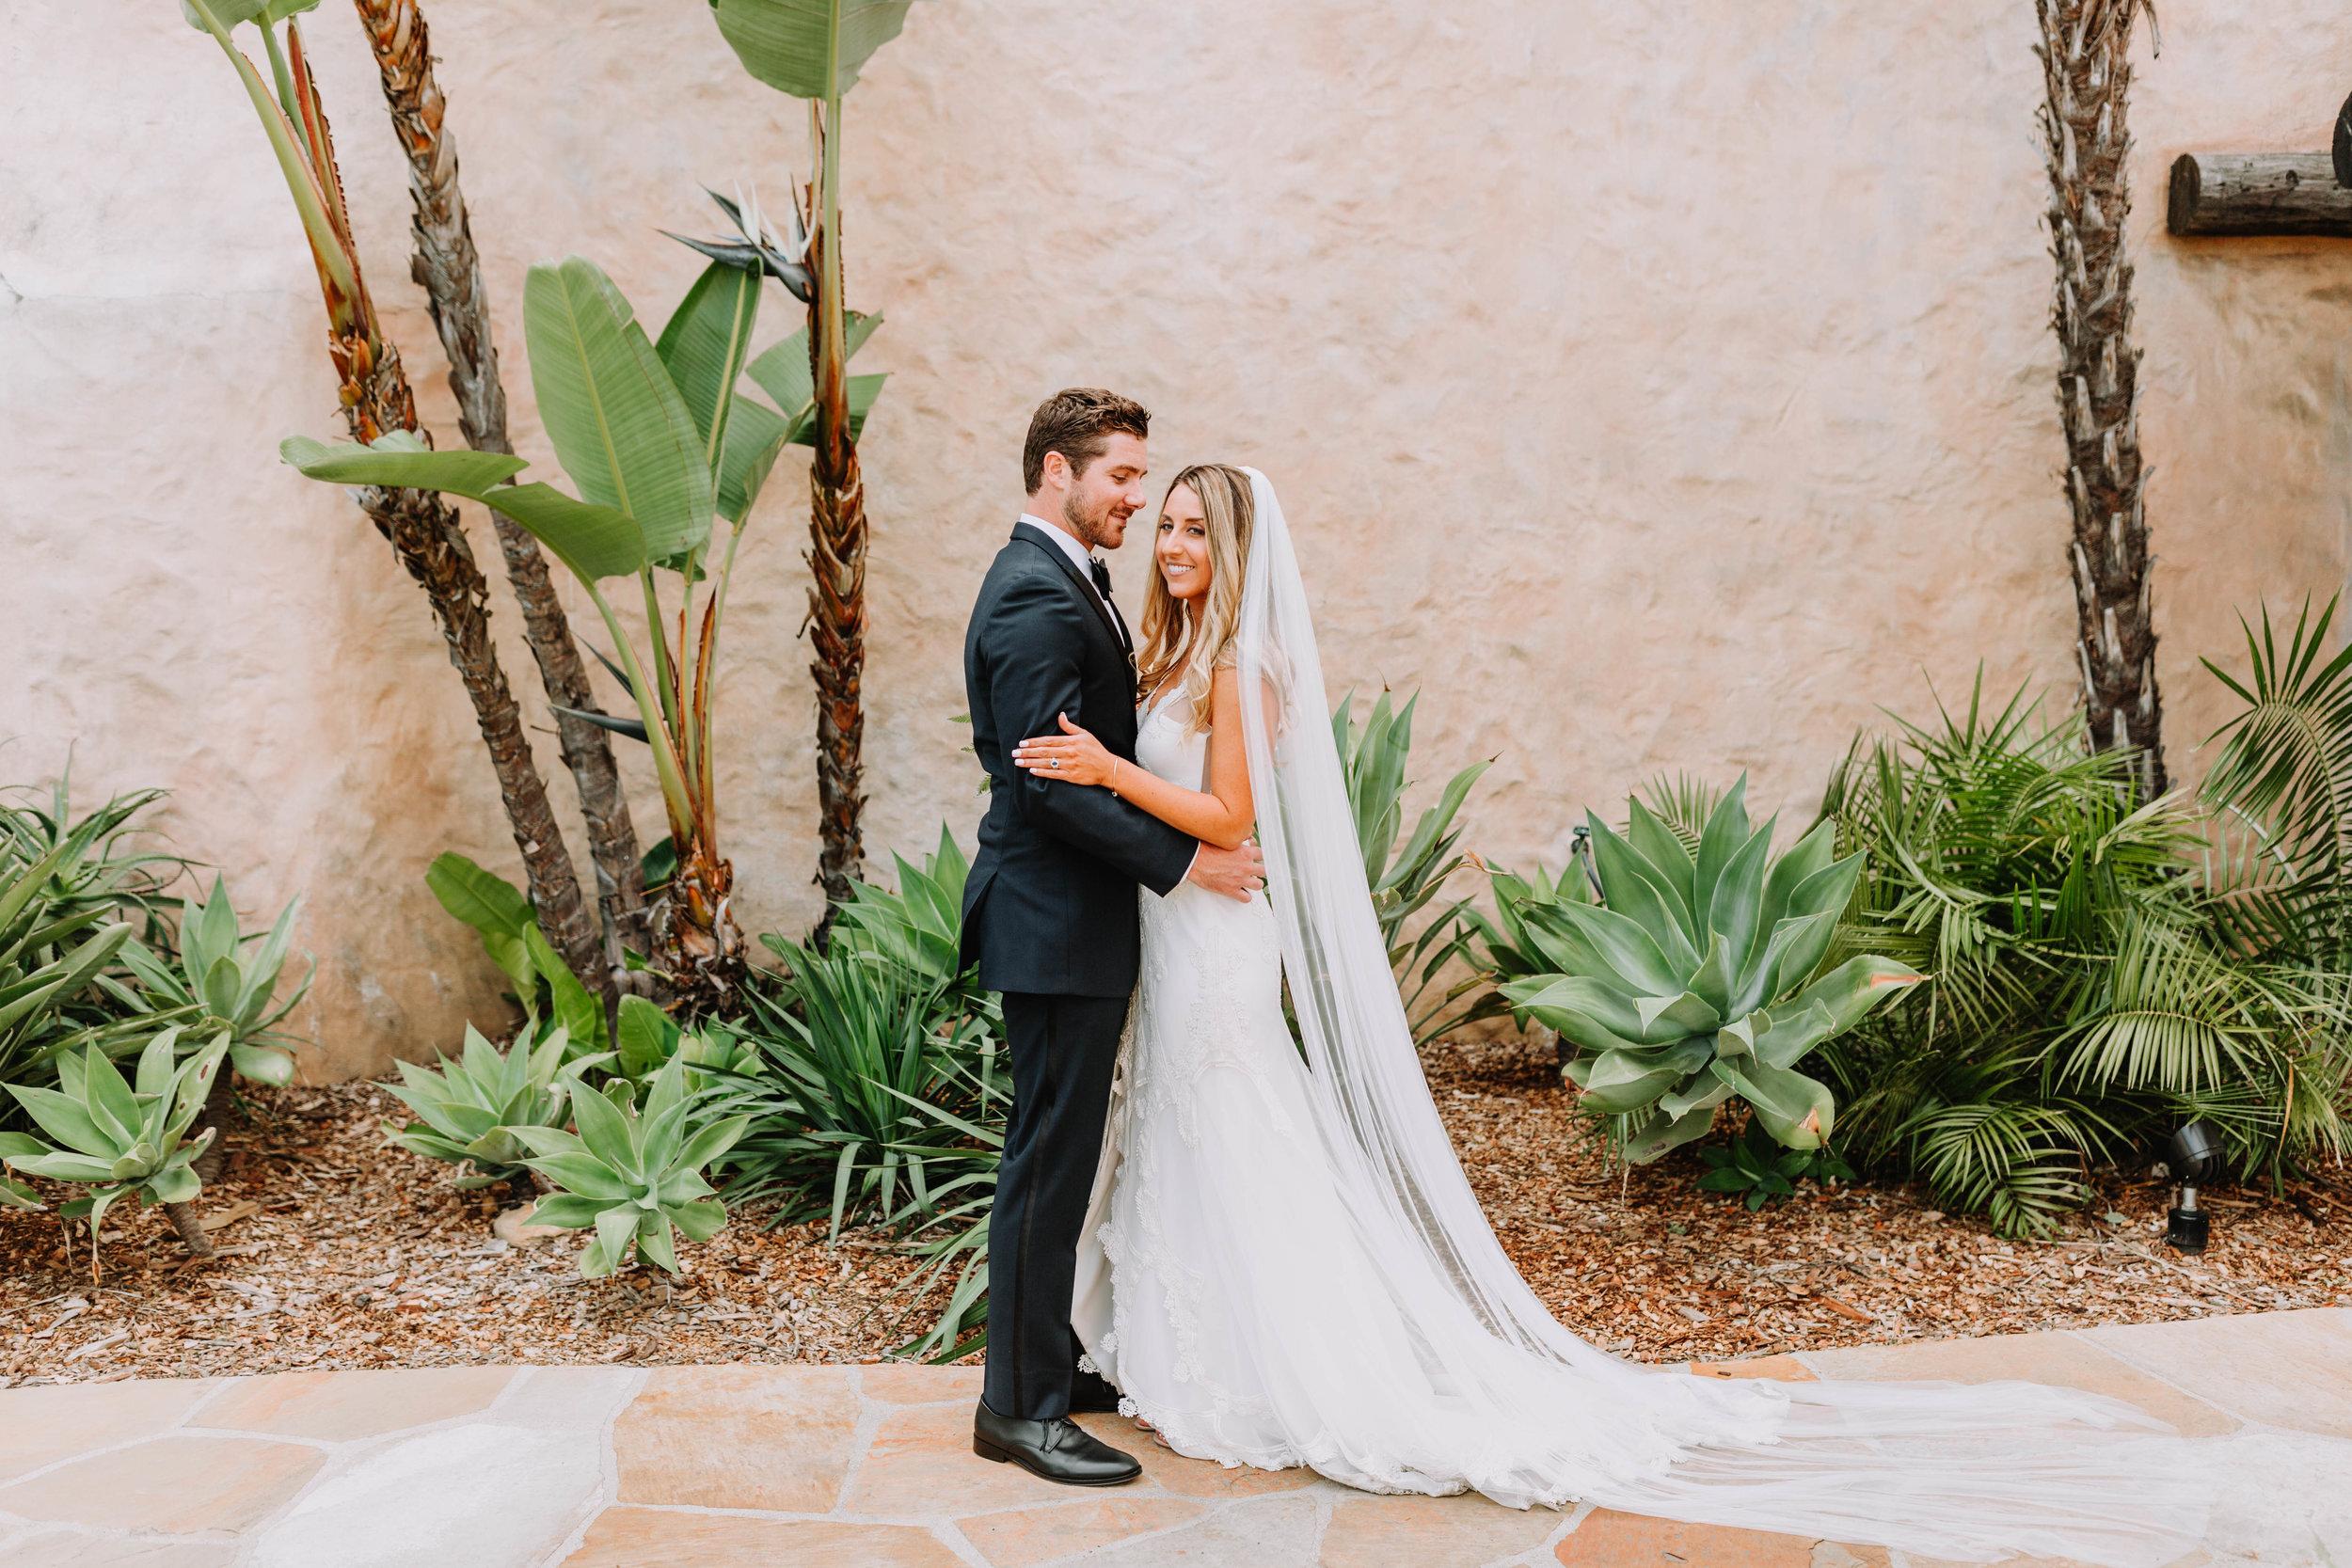 Rachel + Vince | Santa Barbara, CA